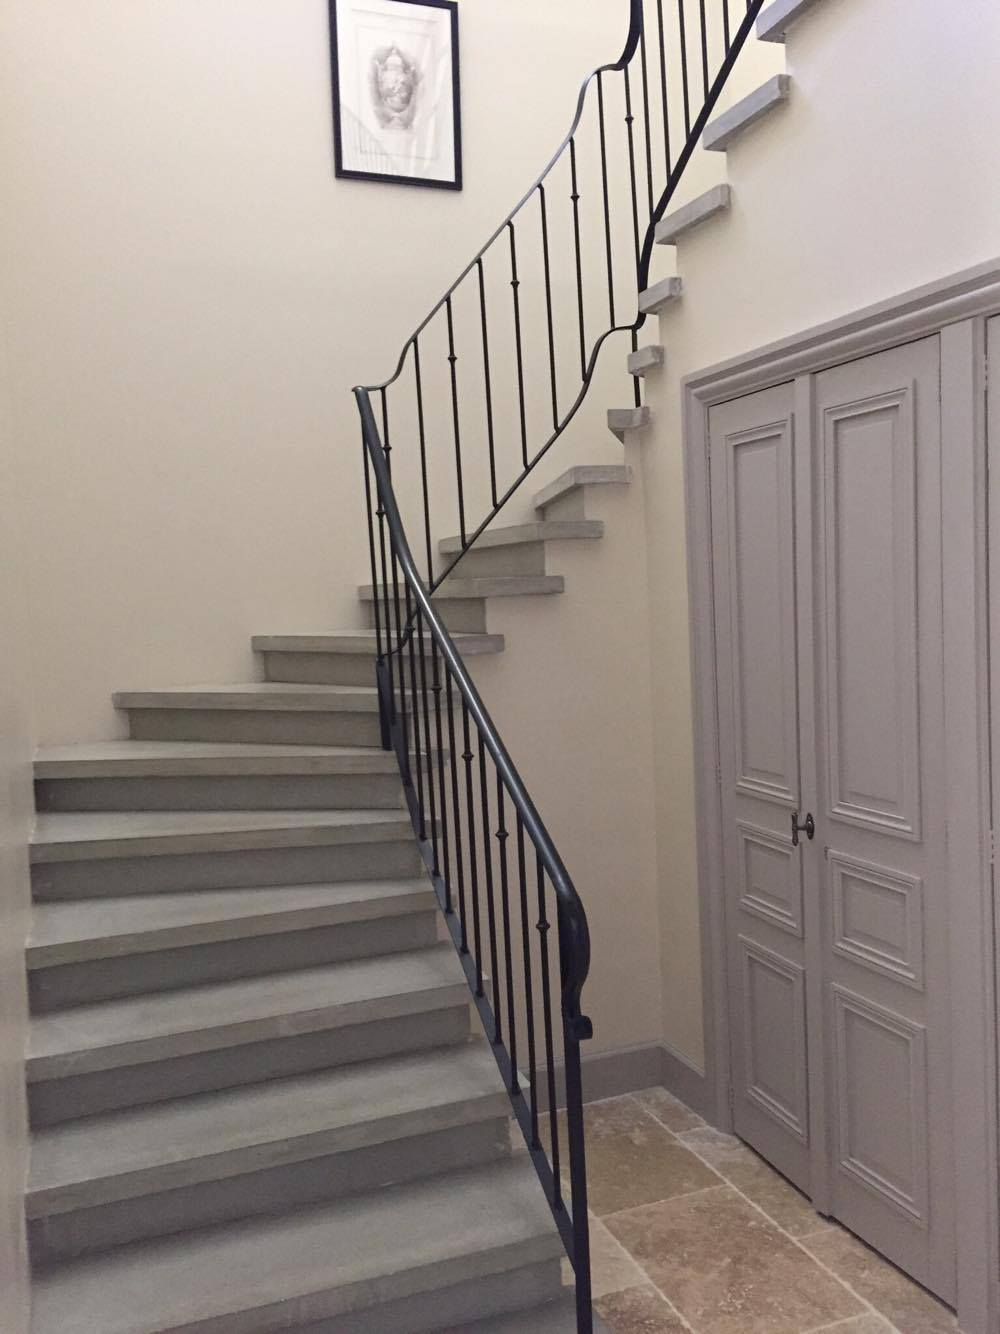 Escalier bois gris photos de conception de maison for Fabrication escalier beton exterieur